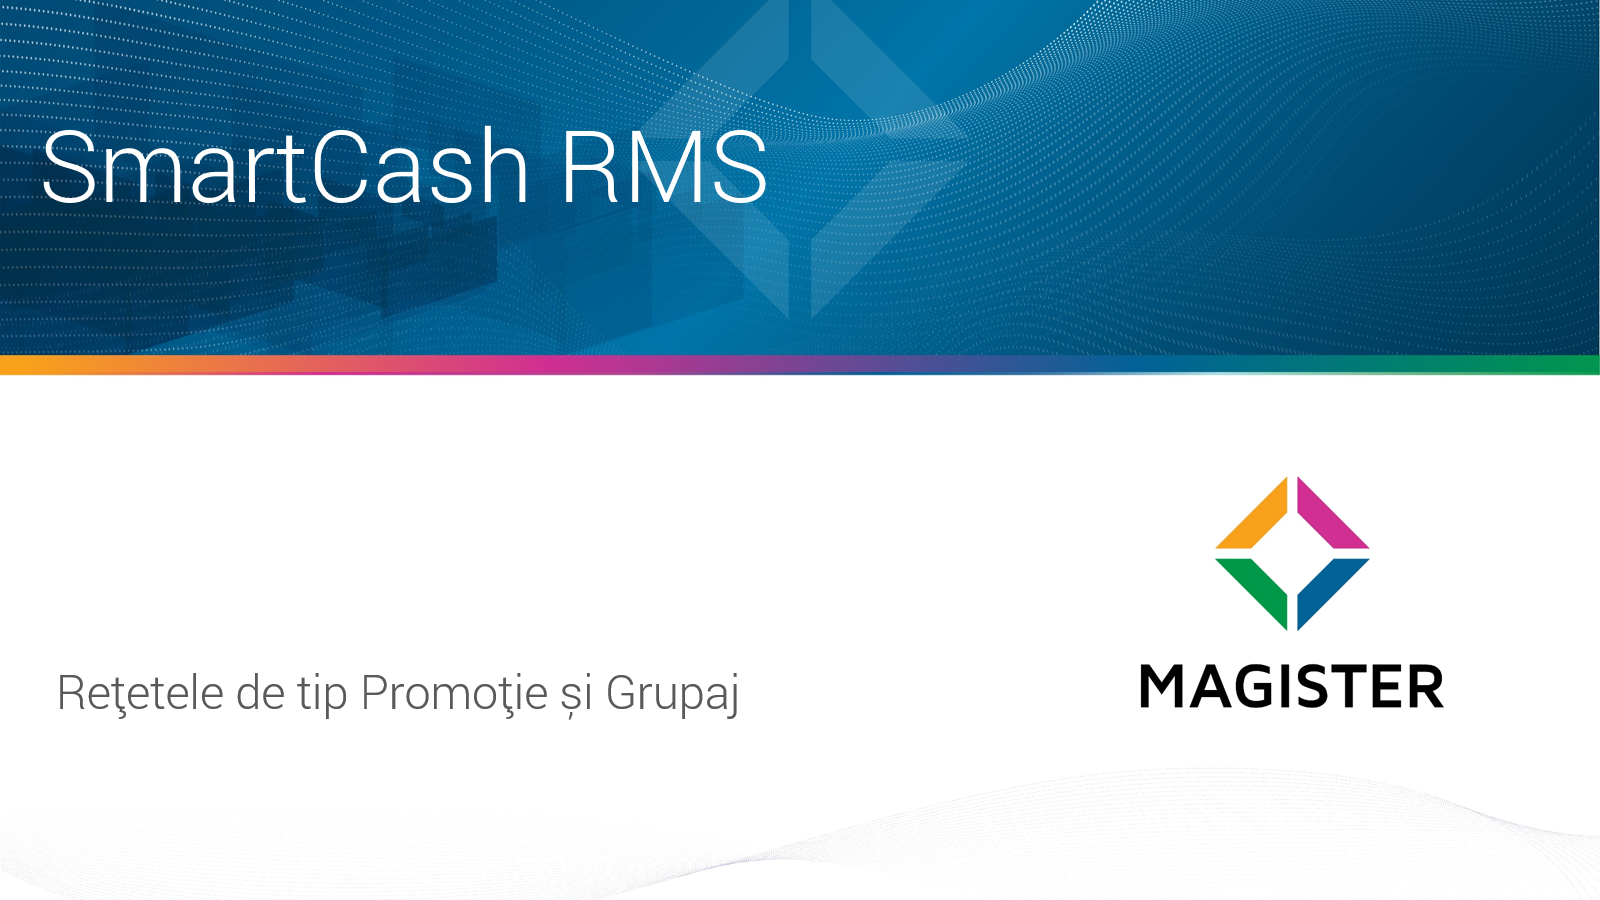 Retetele de tip Promotie si de tip Grupaj in SmartCash RMS 2021